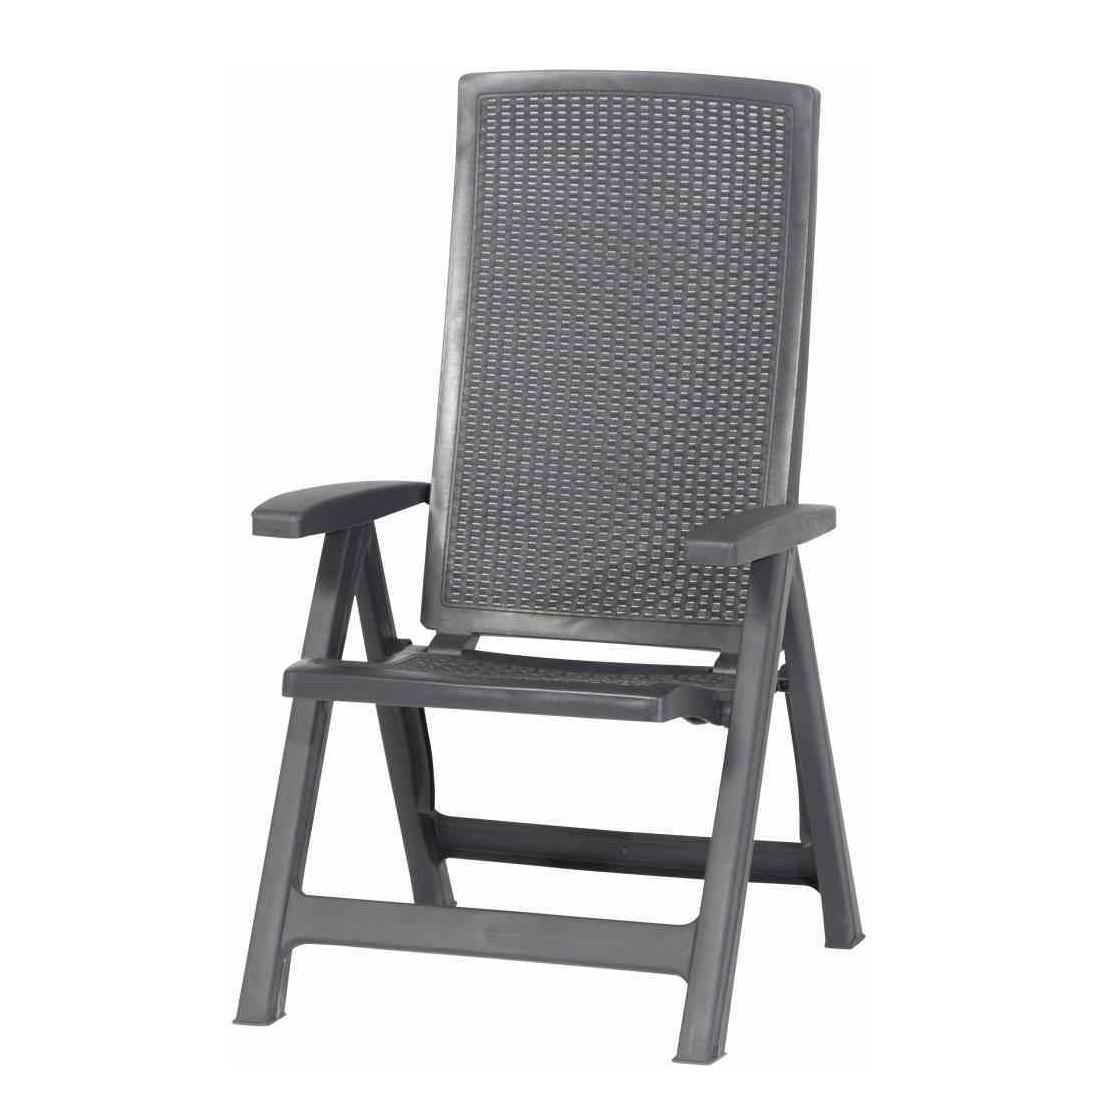 klappstuhl montreal kunststoff graphit jardin jetzt kaufen. Black Bedroom Furniture Sets. Home Design Ideas